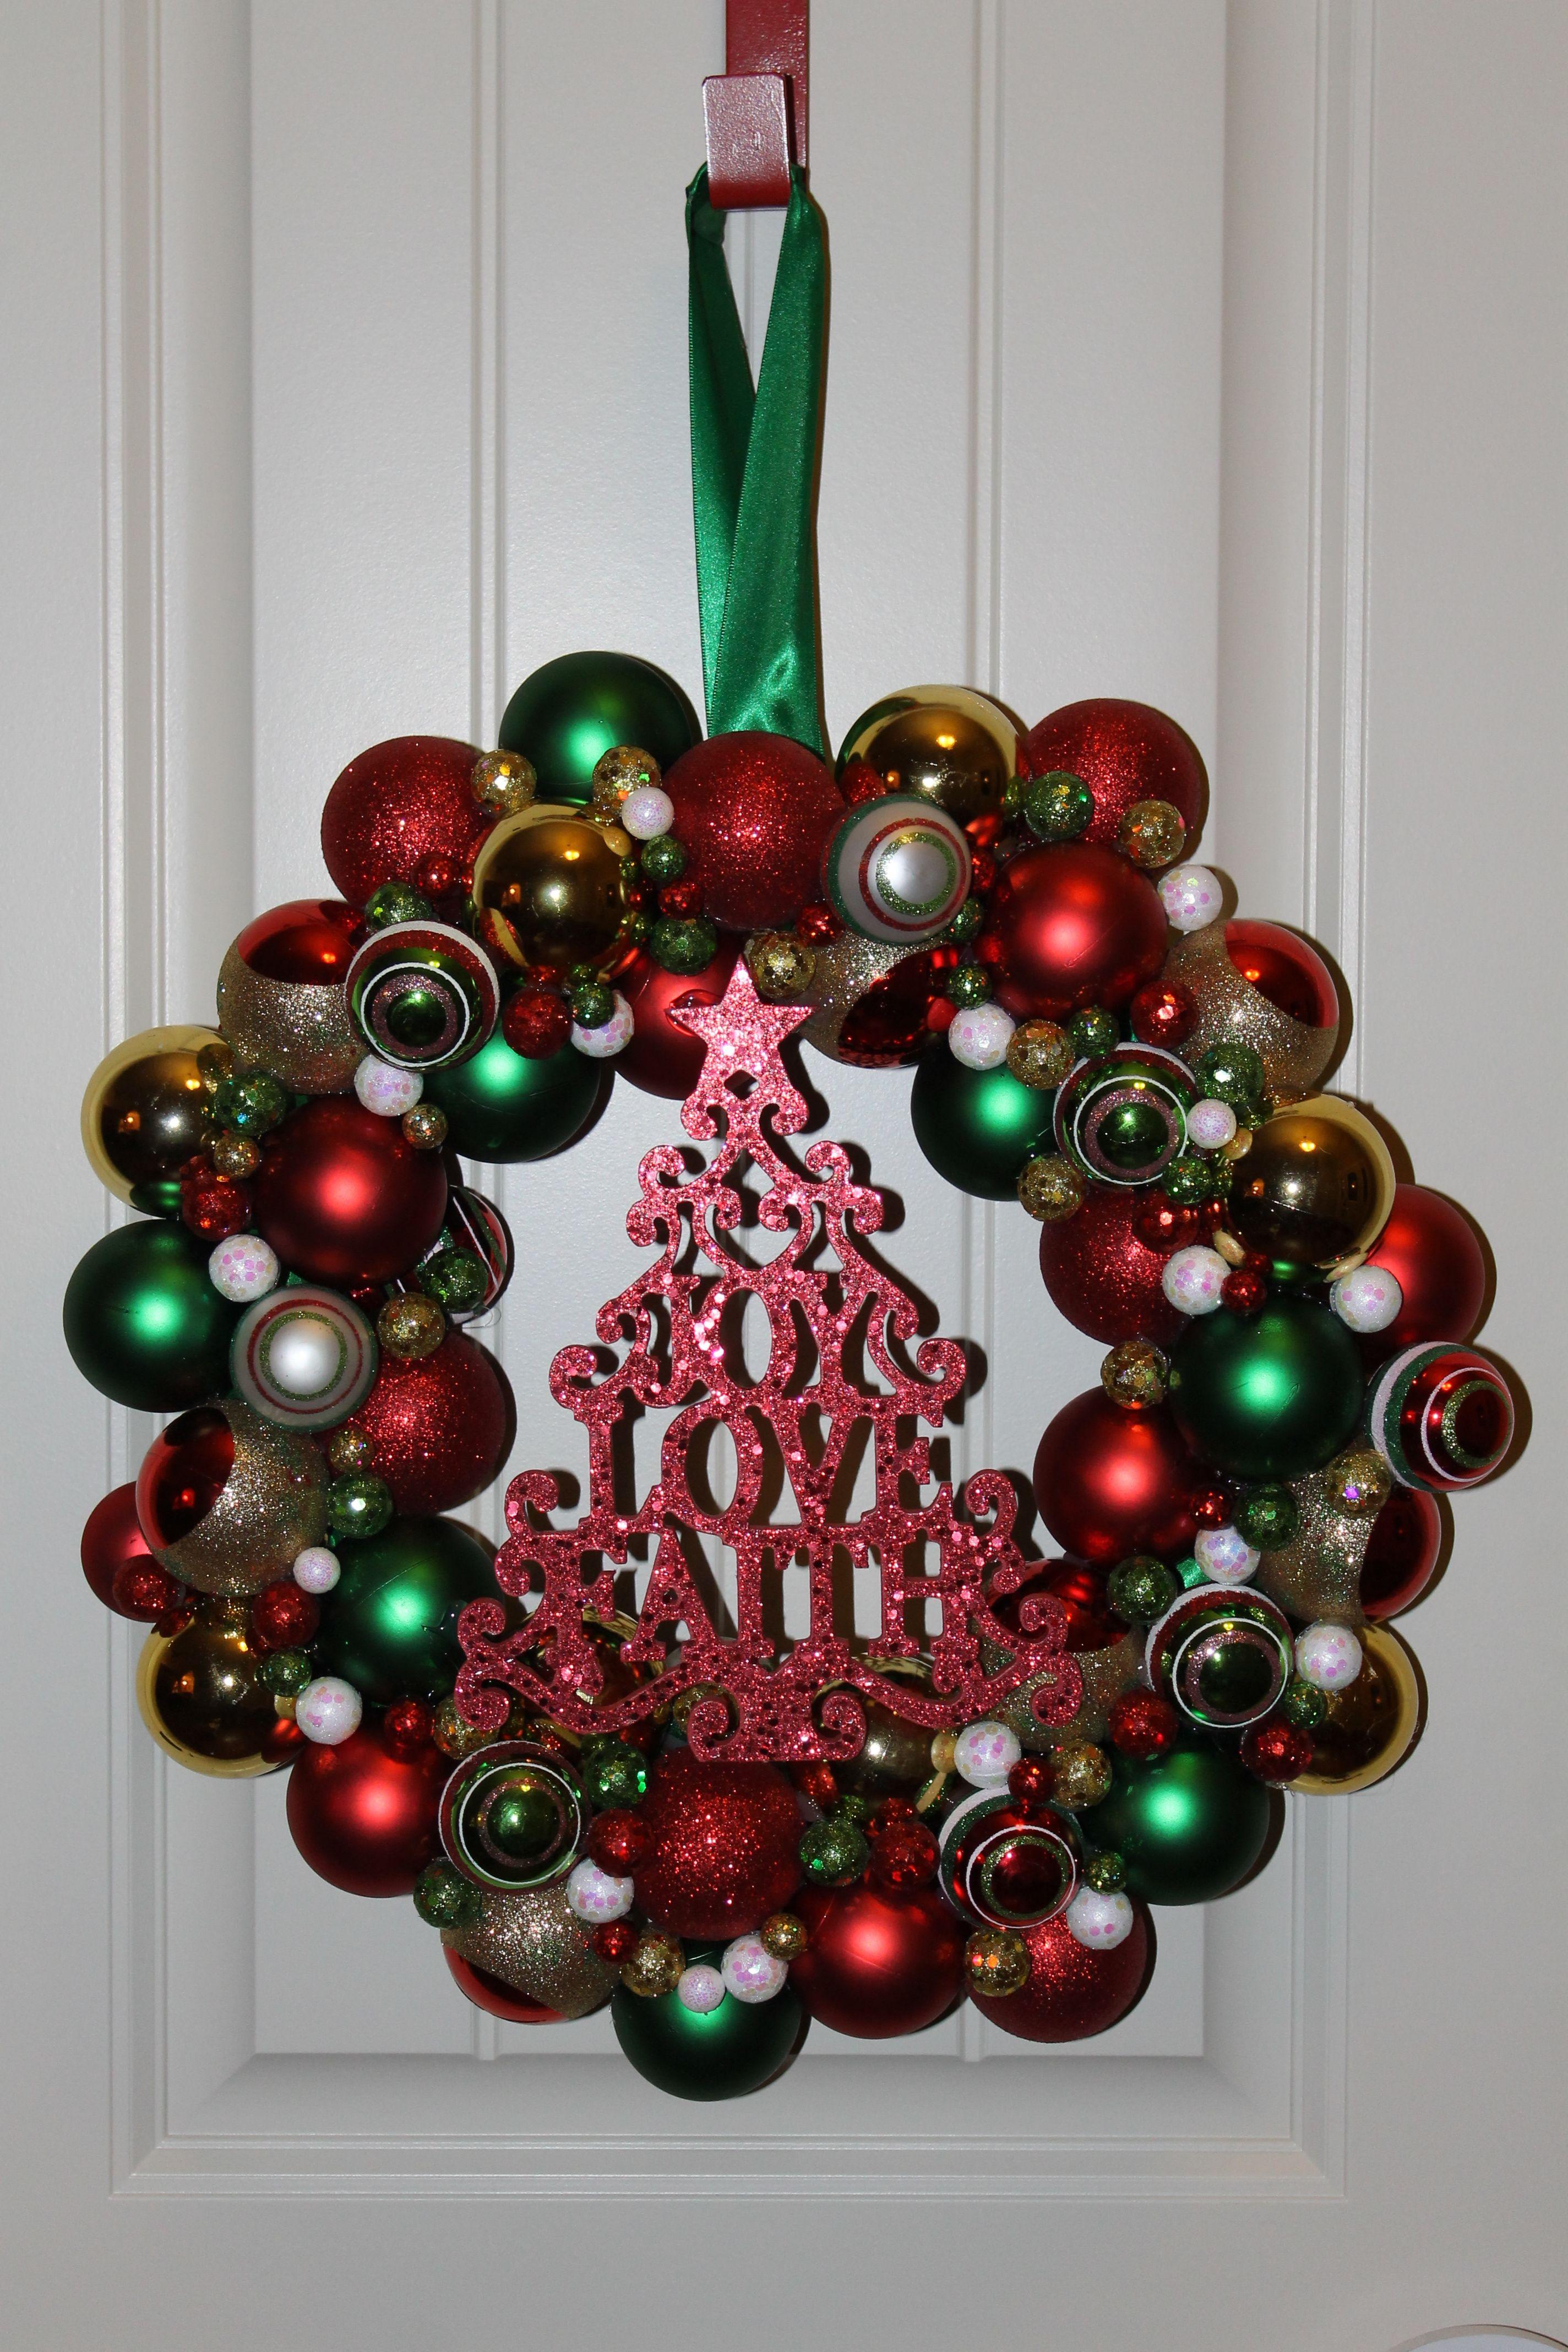 Christmas Wreath I made this with hot glue, a Styrofoam